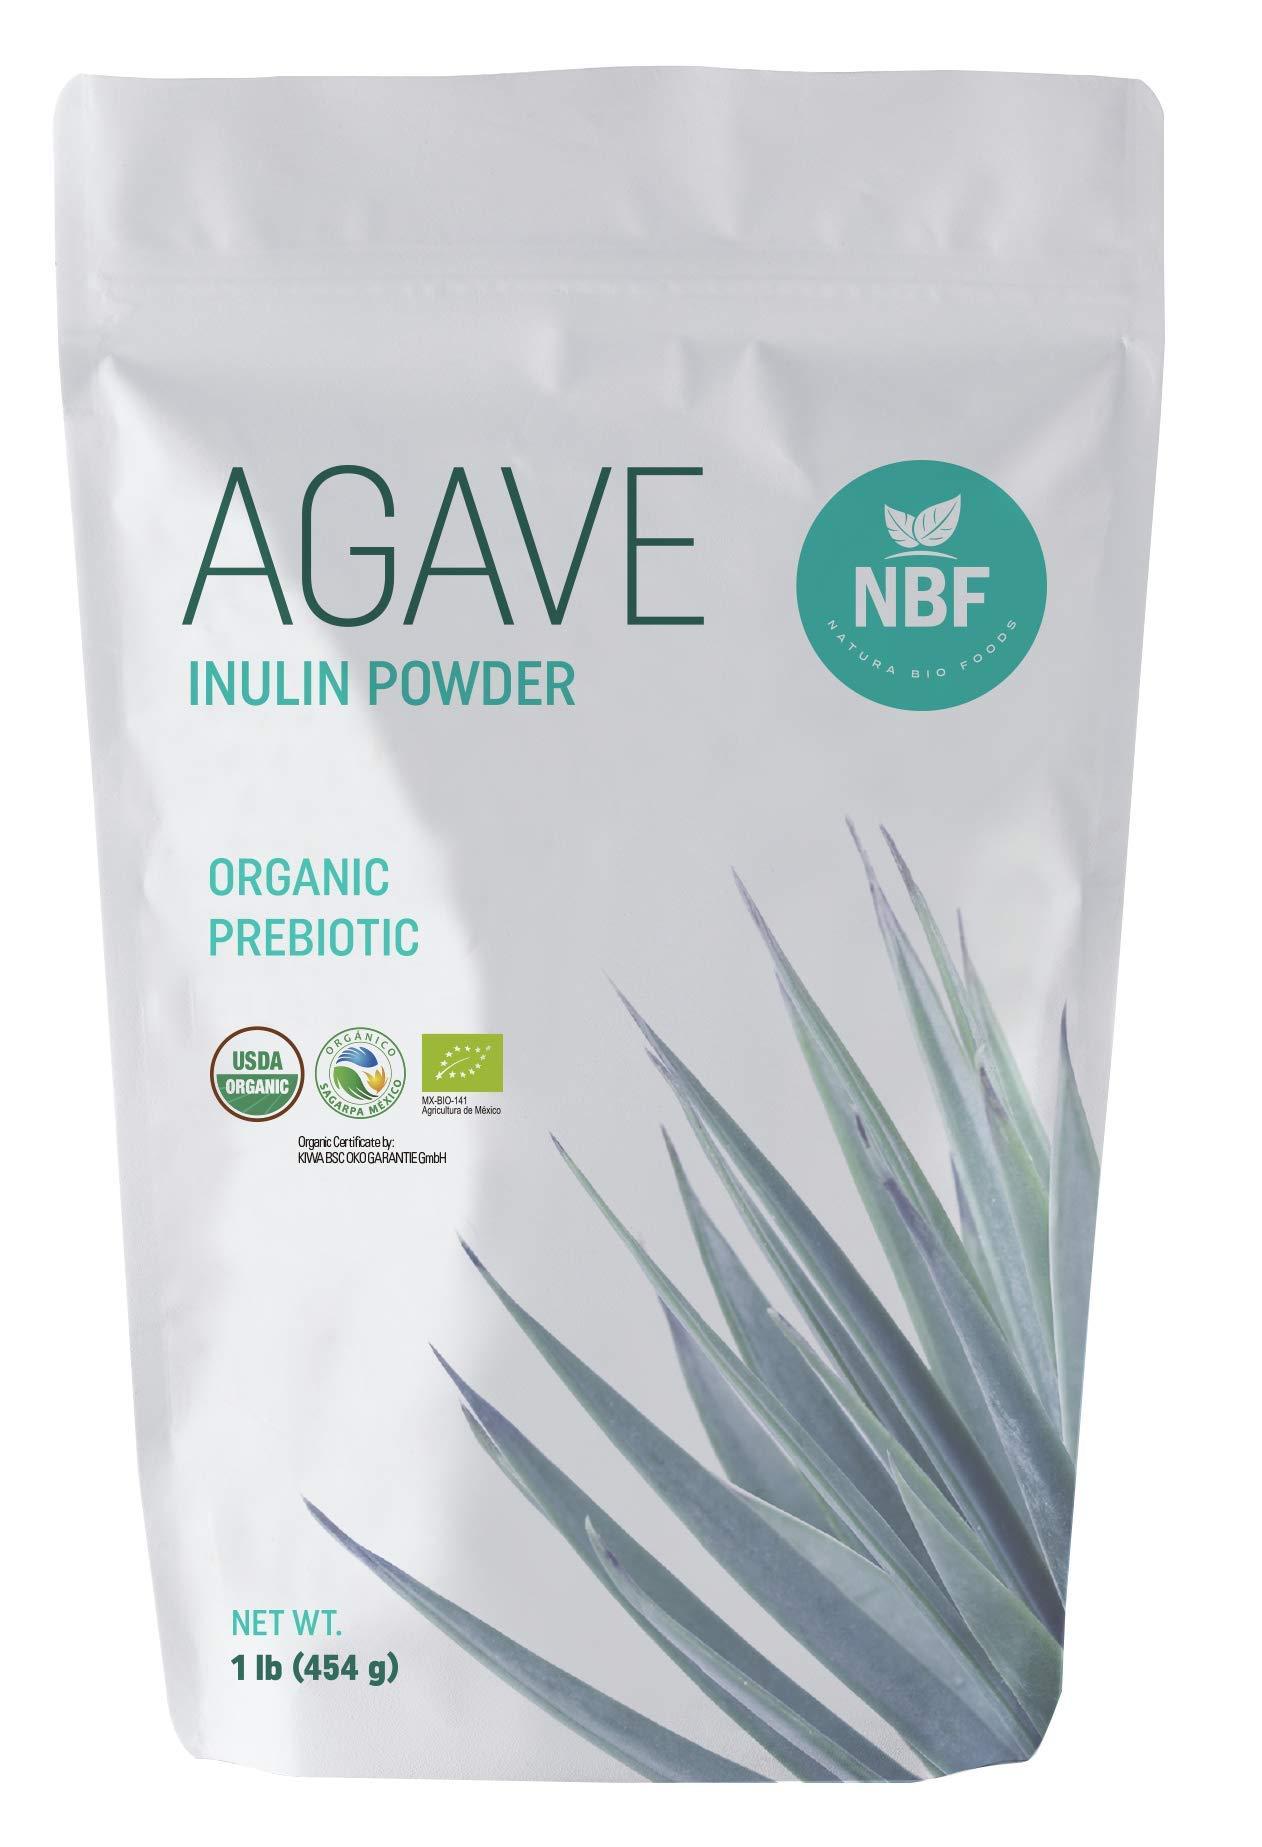 NATURA BIO FOODS Organic Agave Inulin Powder 1 lb 100% Fiber Prebiotic Supplement Low Glycemic Index by Natura Bio Foods